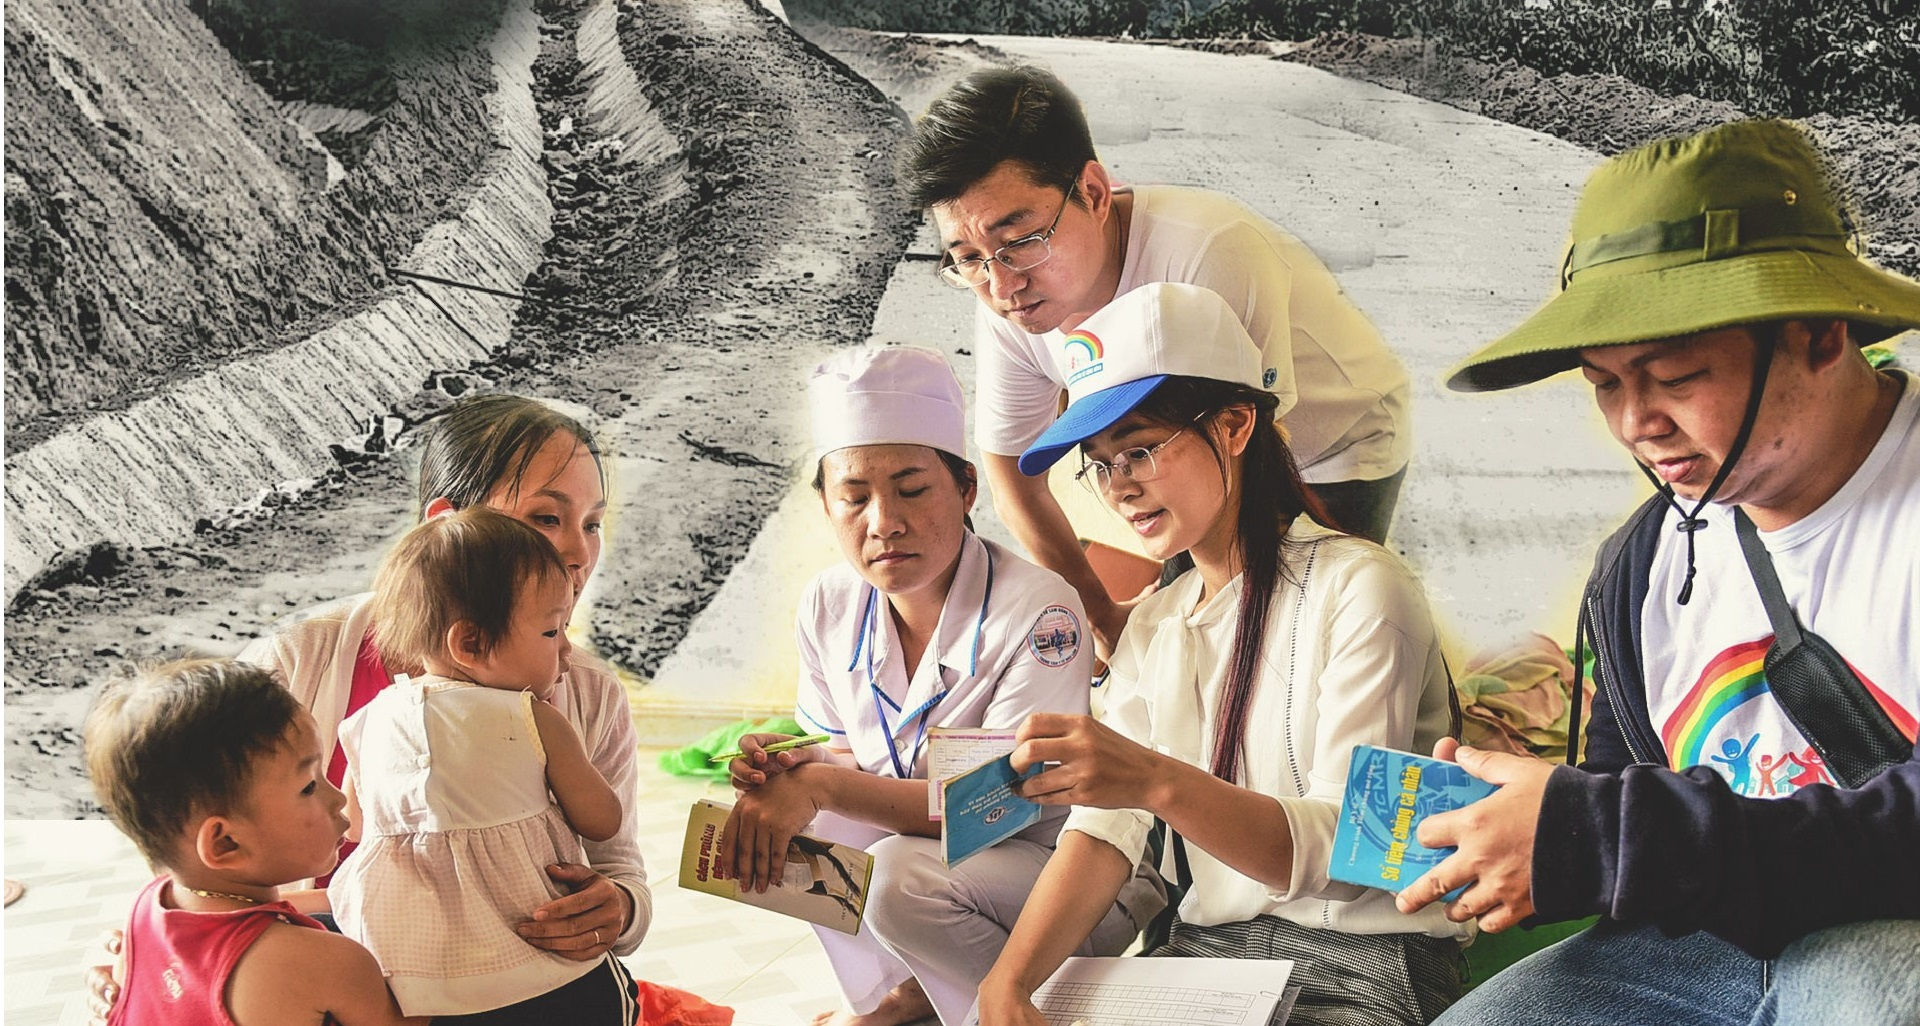 Vietnamese doctors trek through forest to vaccinate far-flung villagers